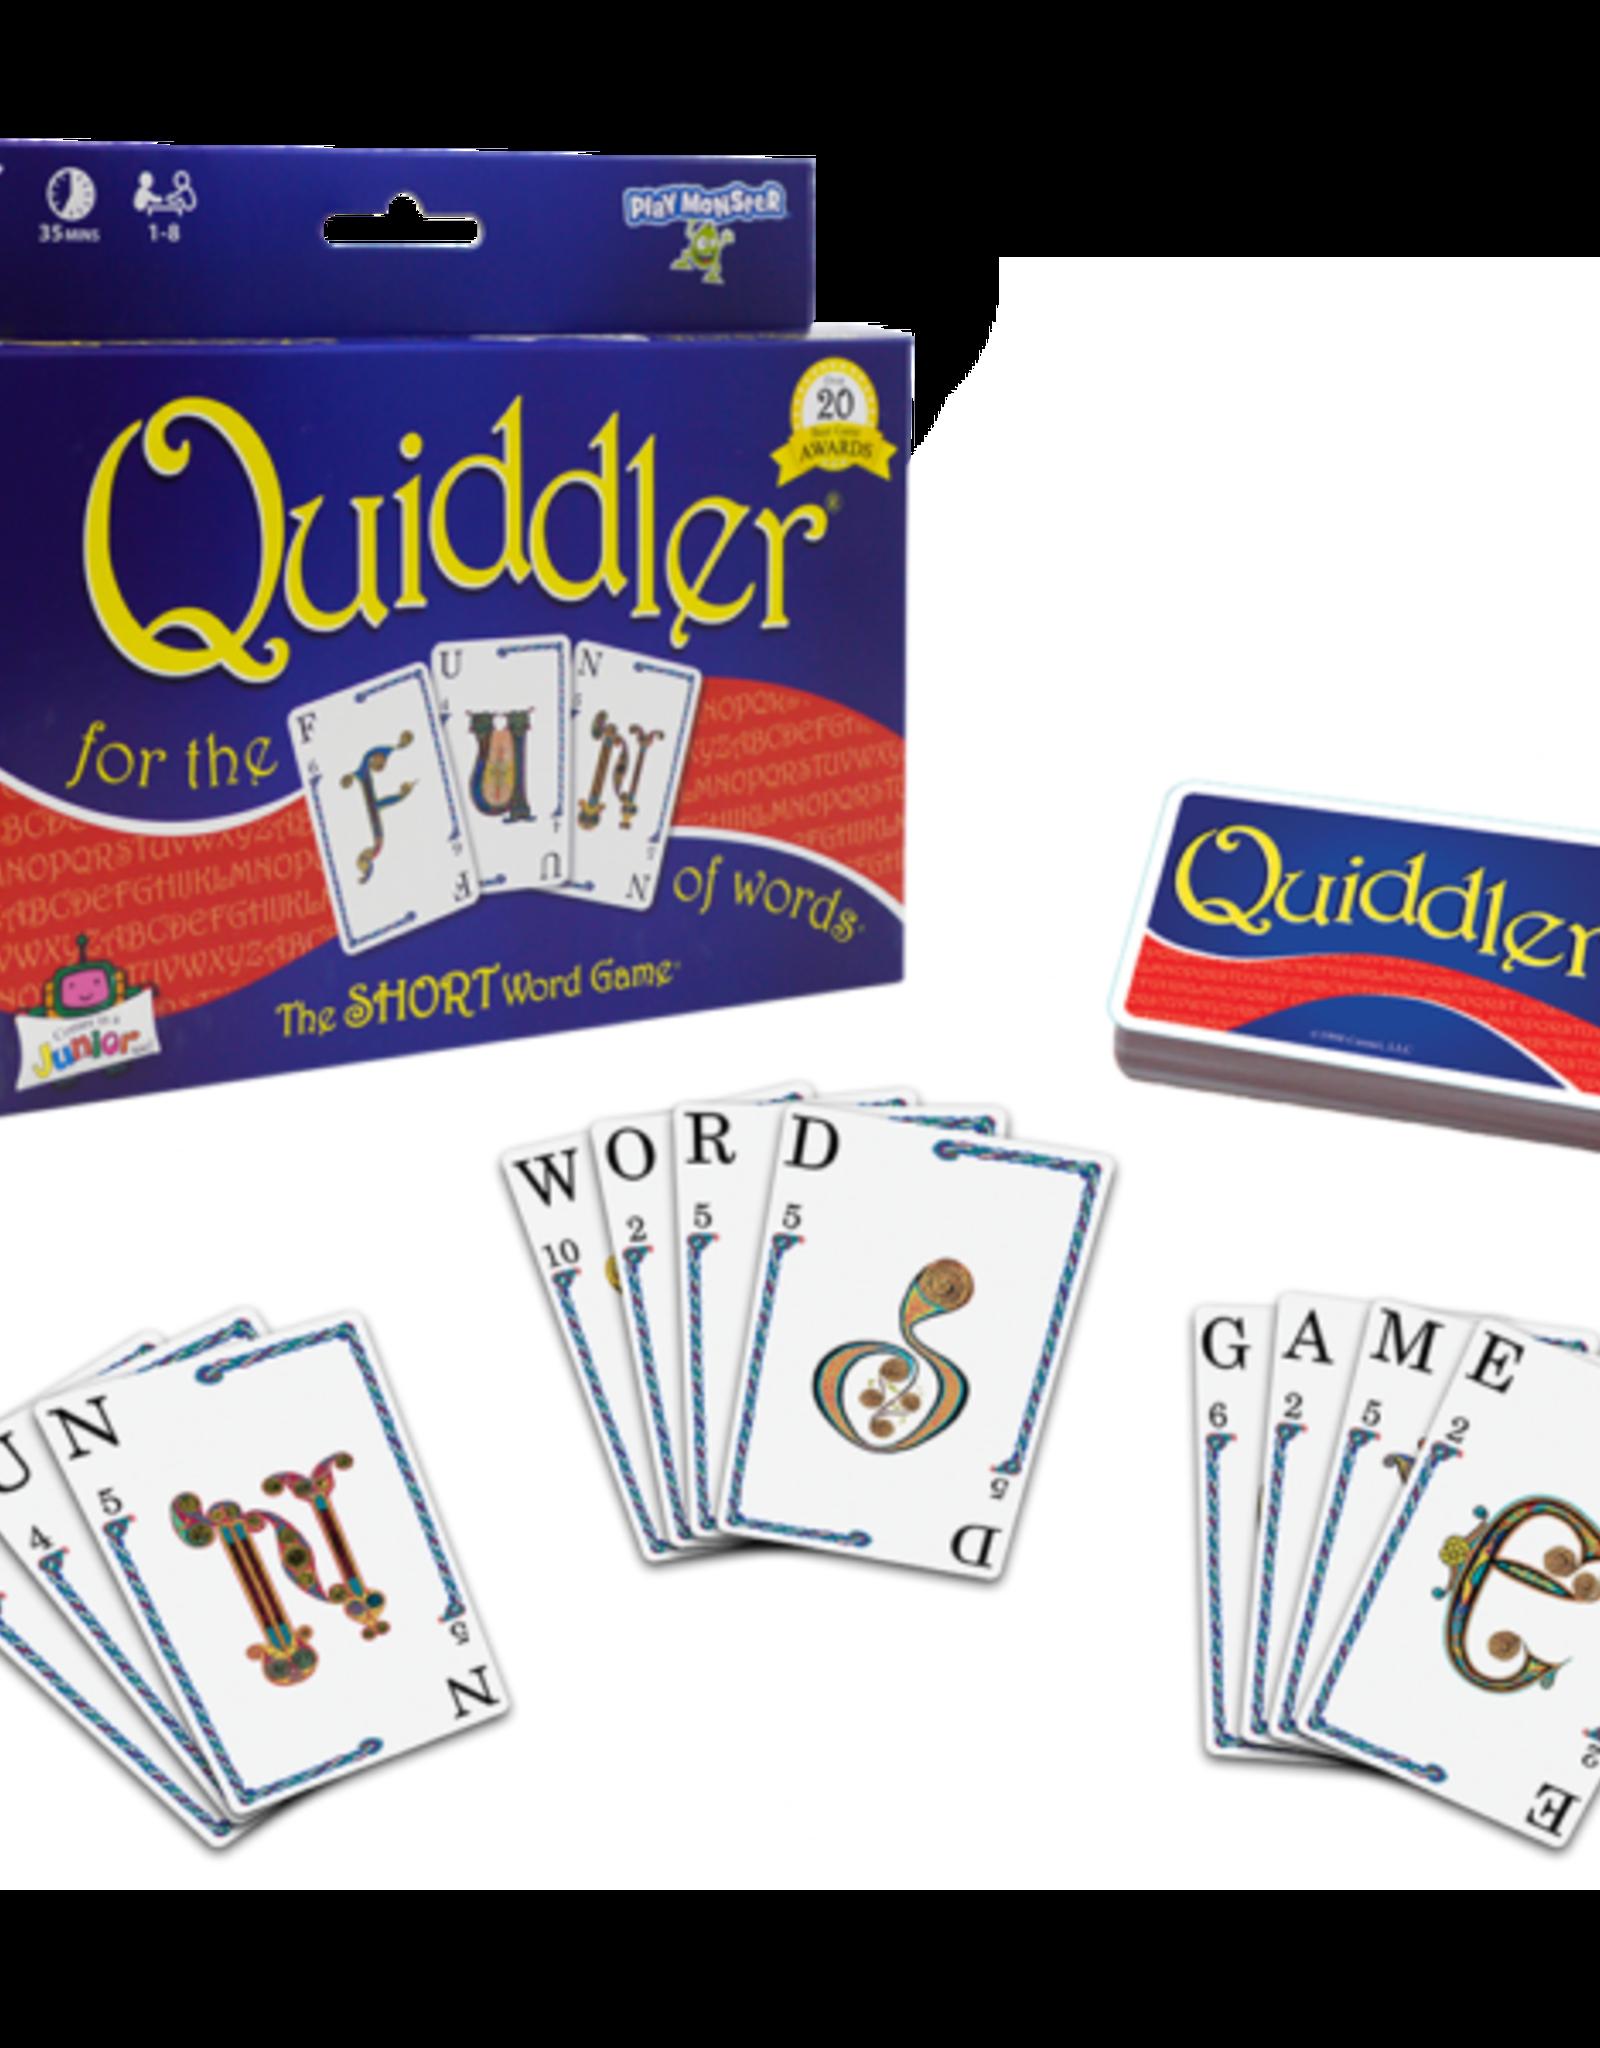 Play Monster Games Quiddler